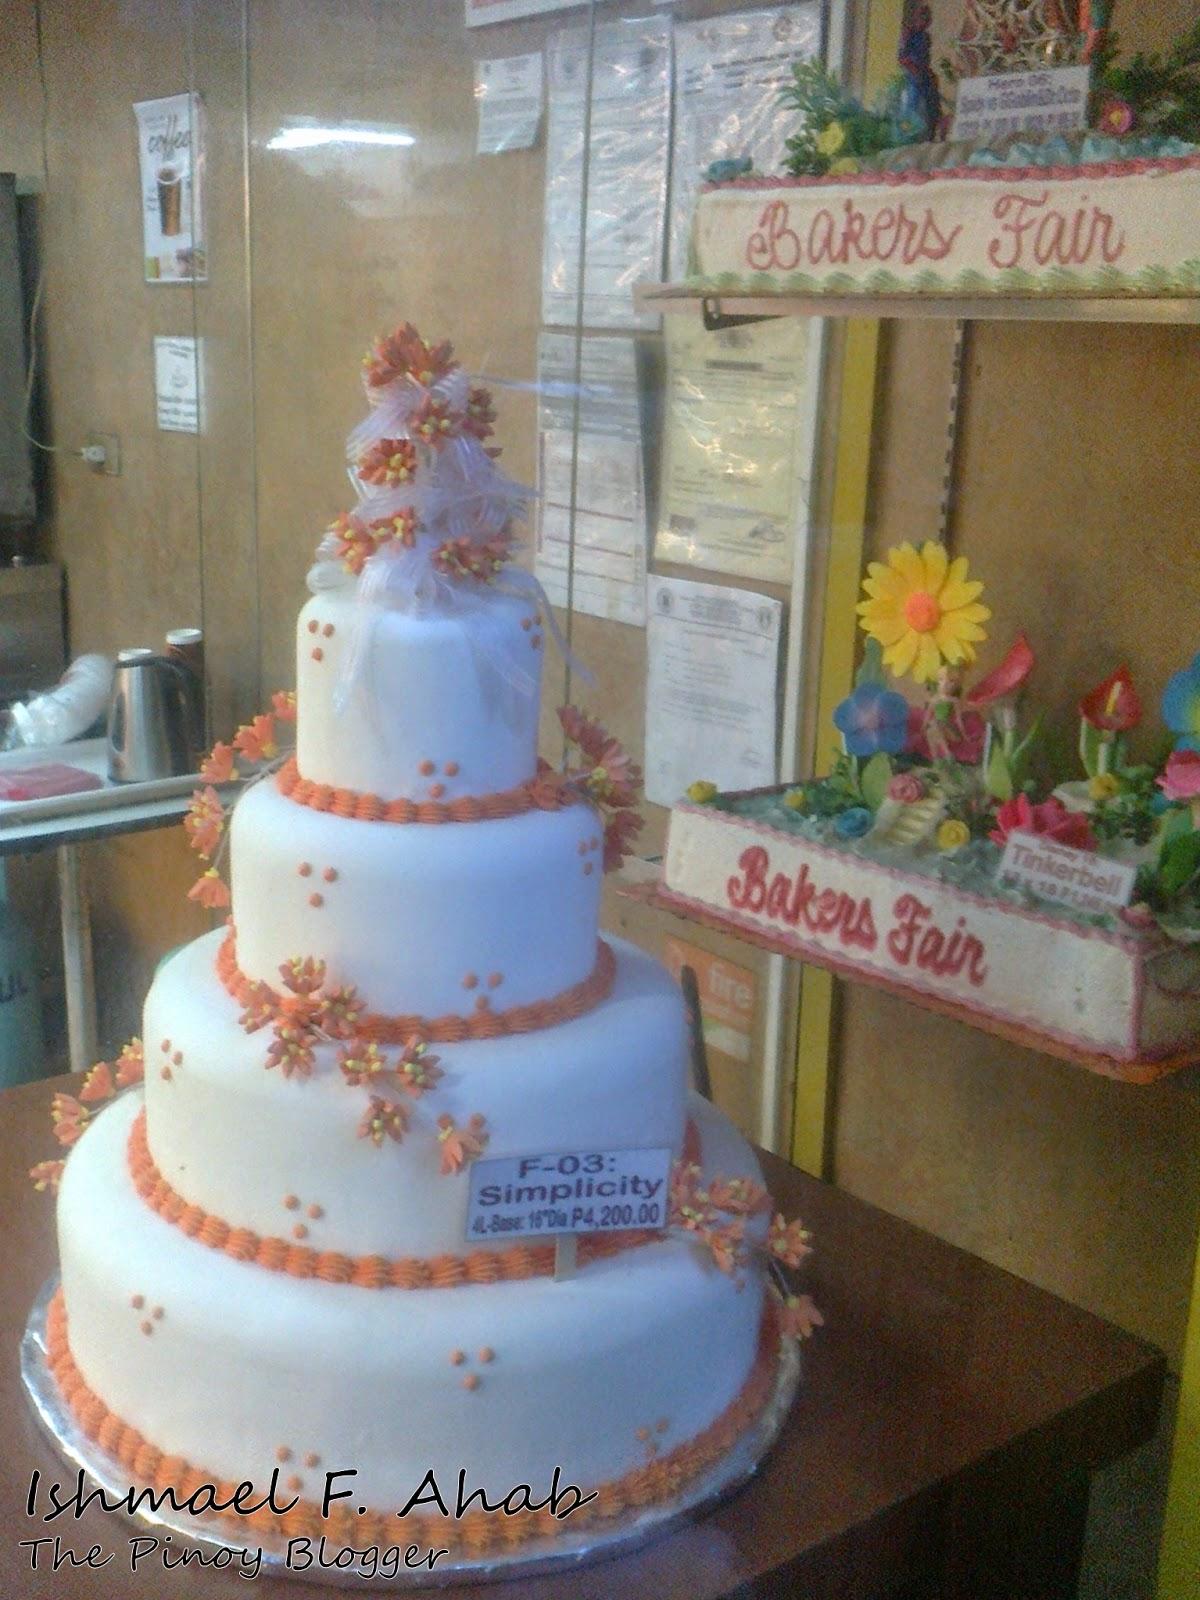 Bakers Fair Cake